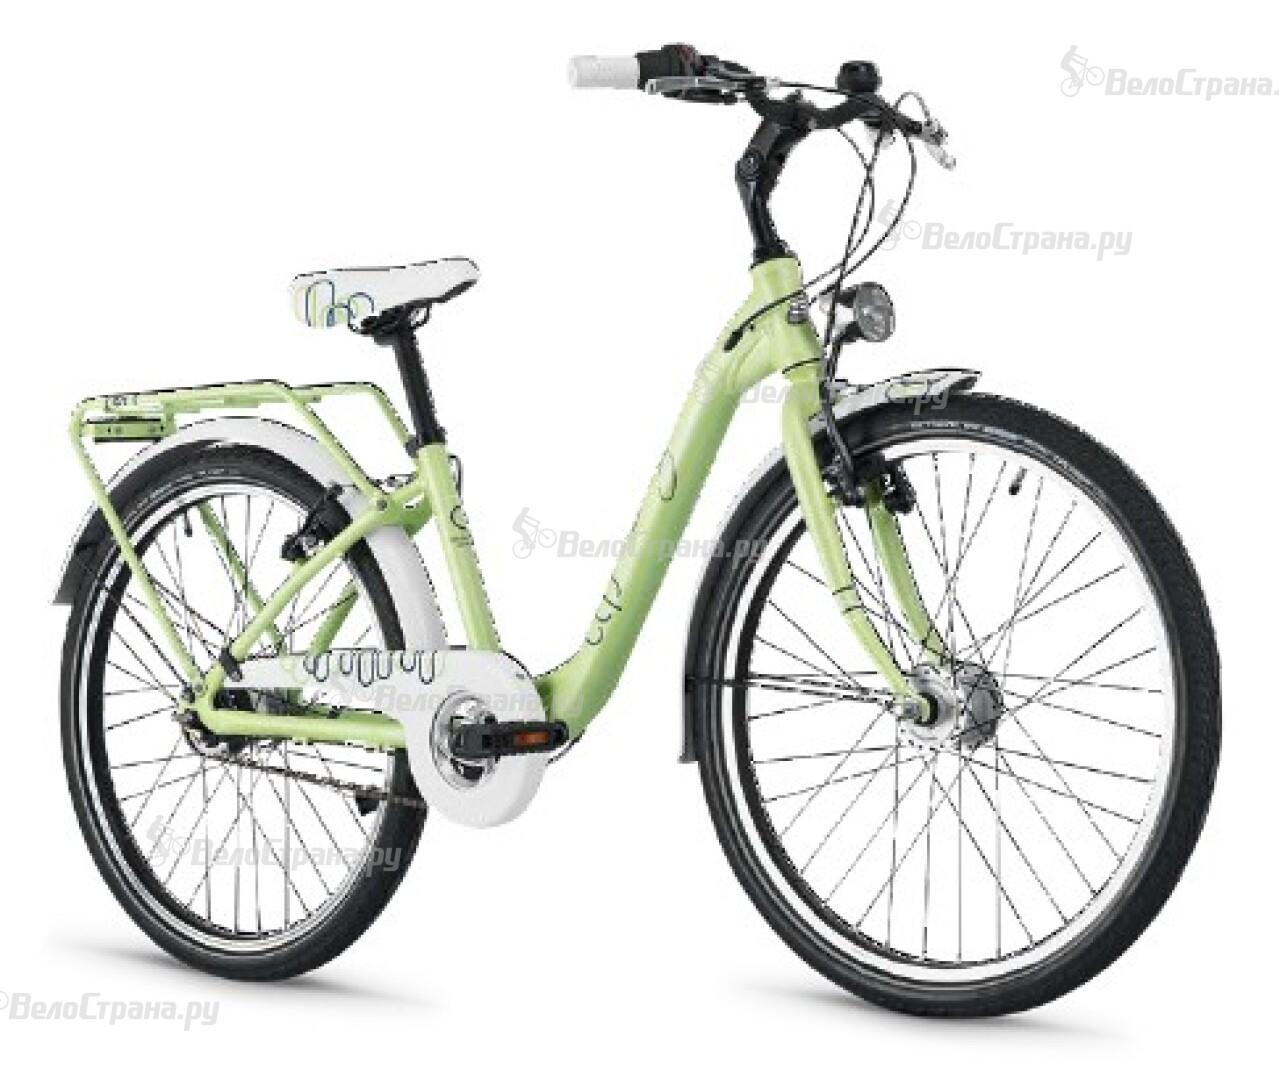 Велосипед Scool ChiX 24 3S (2014) велосипед scool chix pro 24 24 s 2016